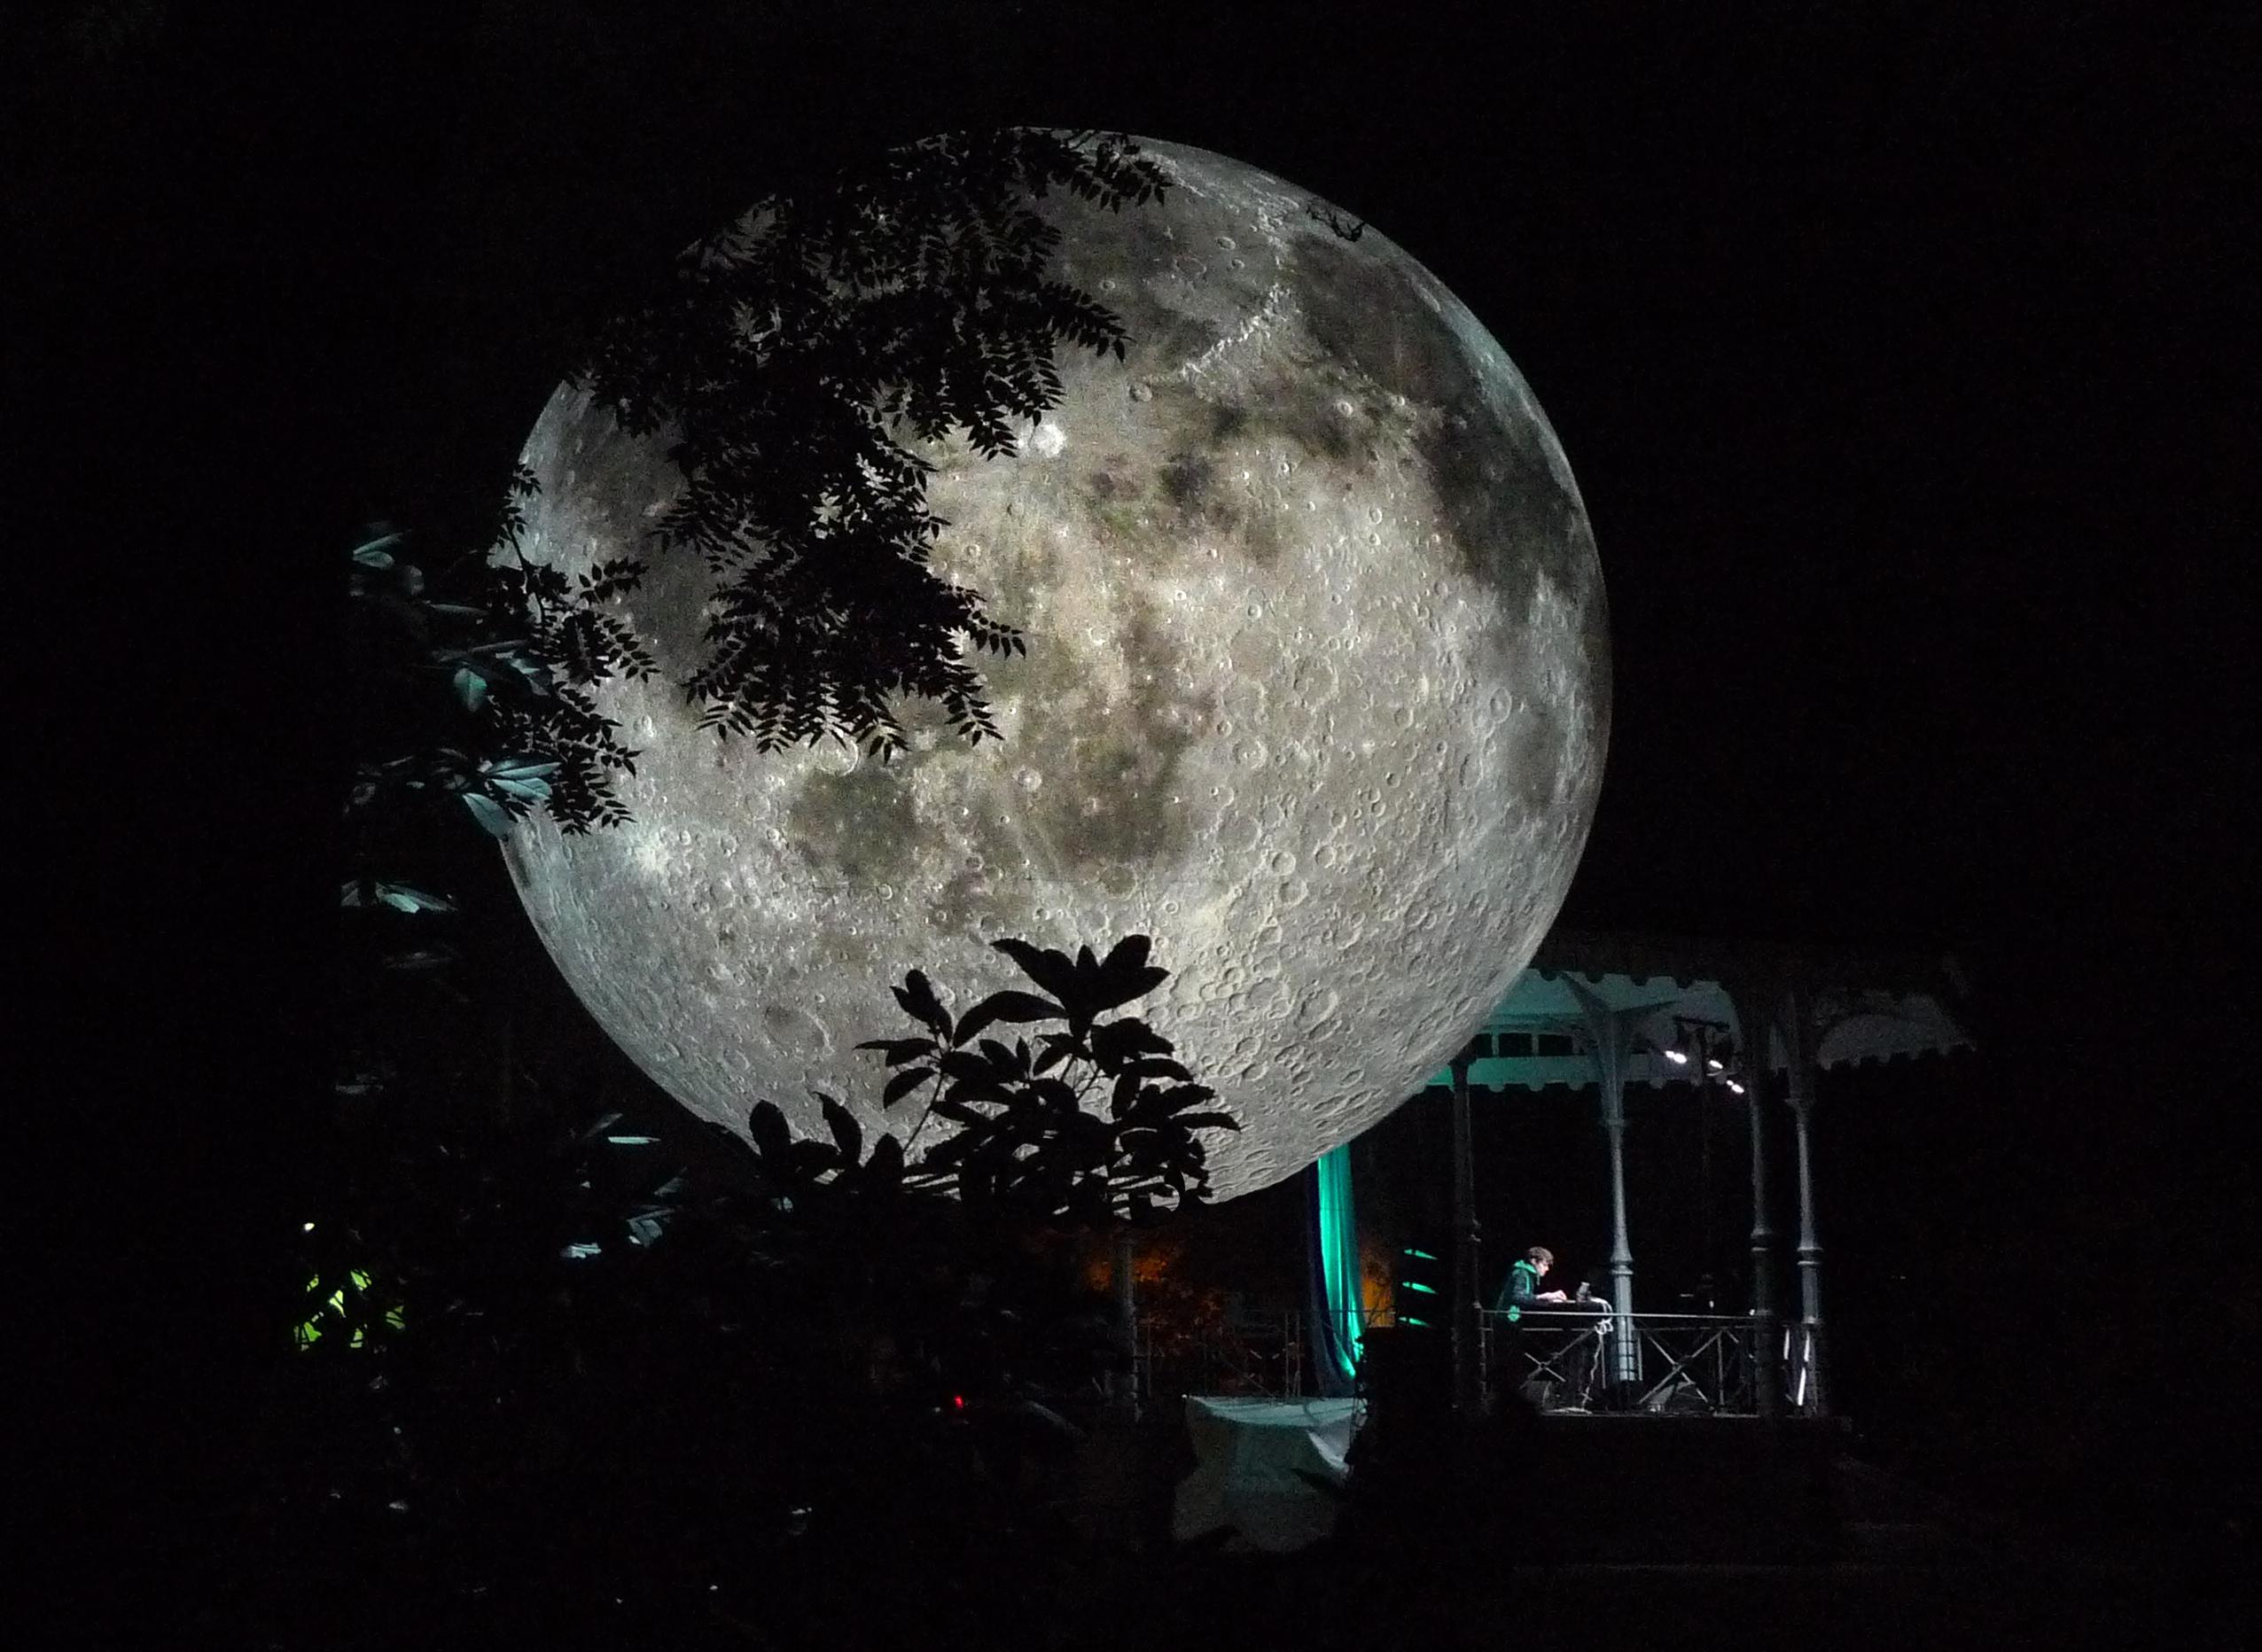 em_festival-bigbang-museum-of-the-moon.jpg